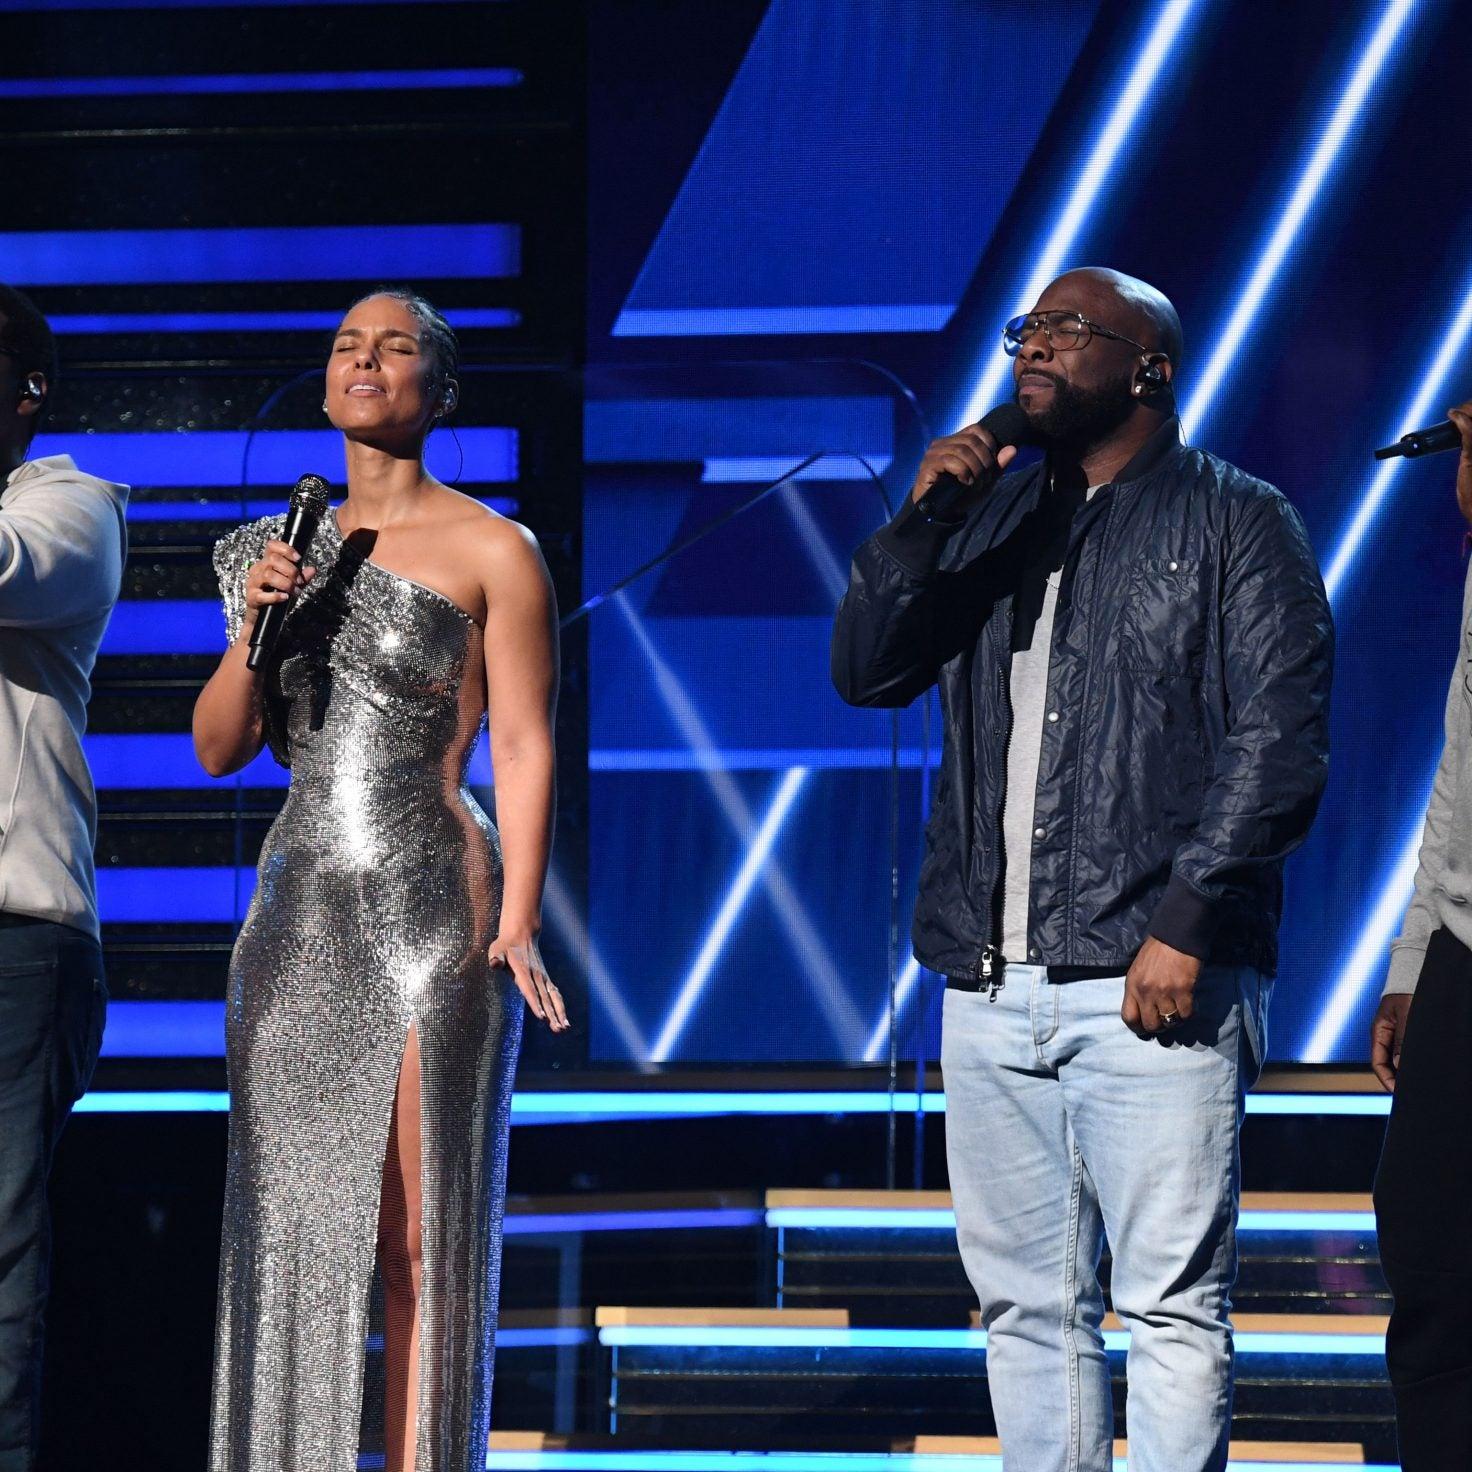 RIP Kobe Bryant: Alicia Keys And Boyz II Men Open Grammy Awards With 'It's So Hard to Say Goodbye'